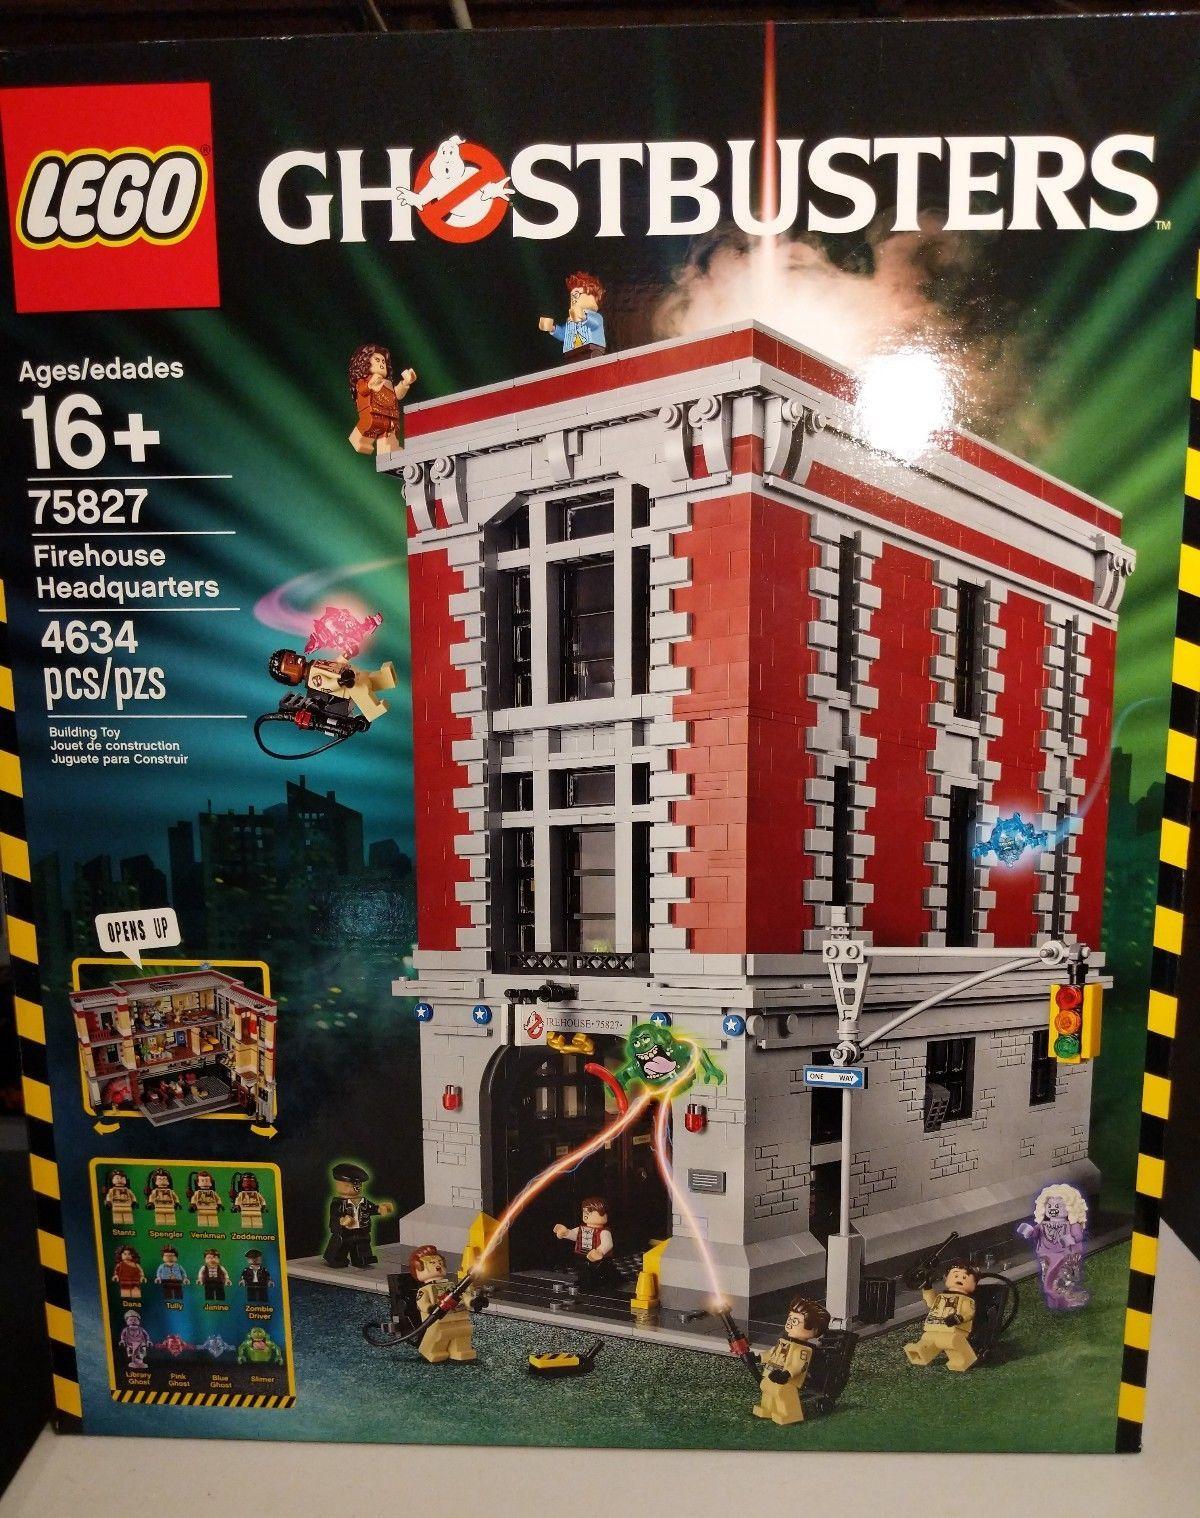 Lego Lego Lego Ghostbuster Ghostbuster Ghostbuster Jouet Club Club Jouet nOP8ymNvw0